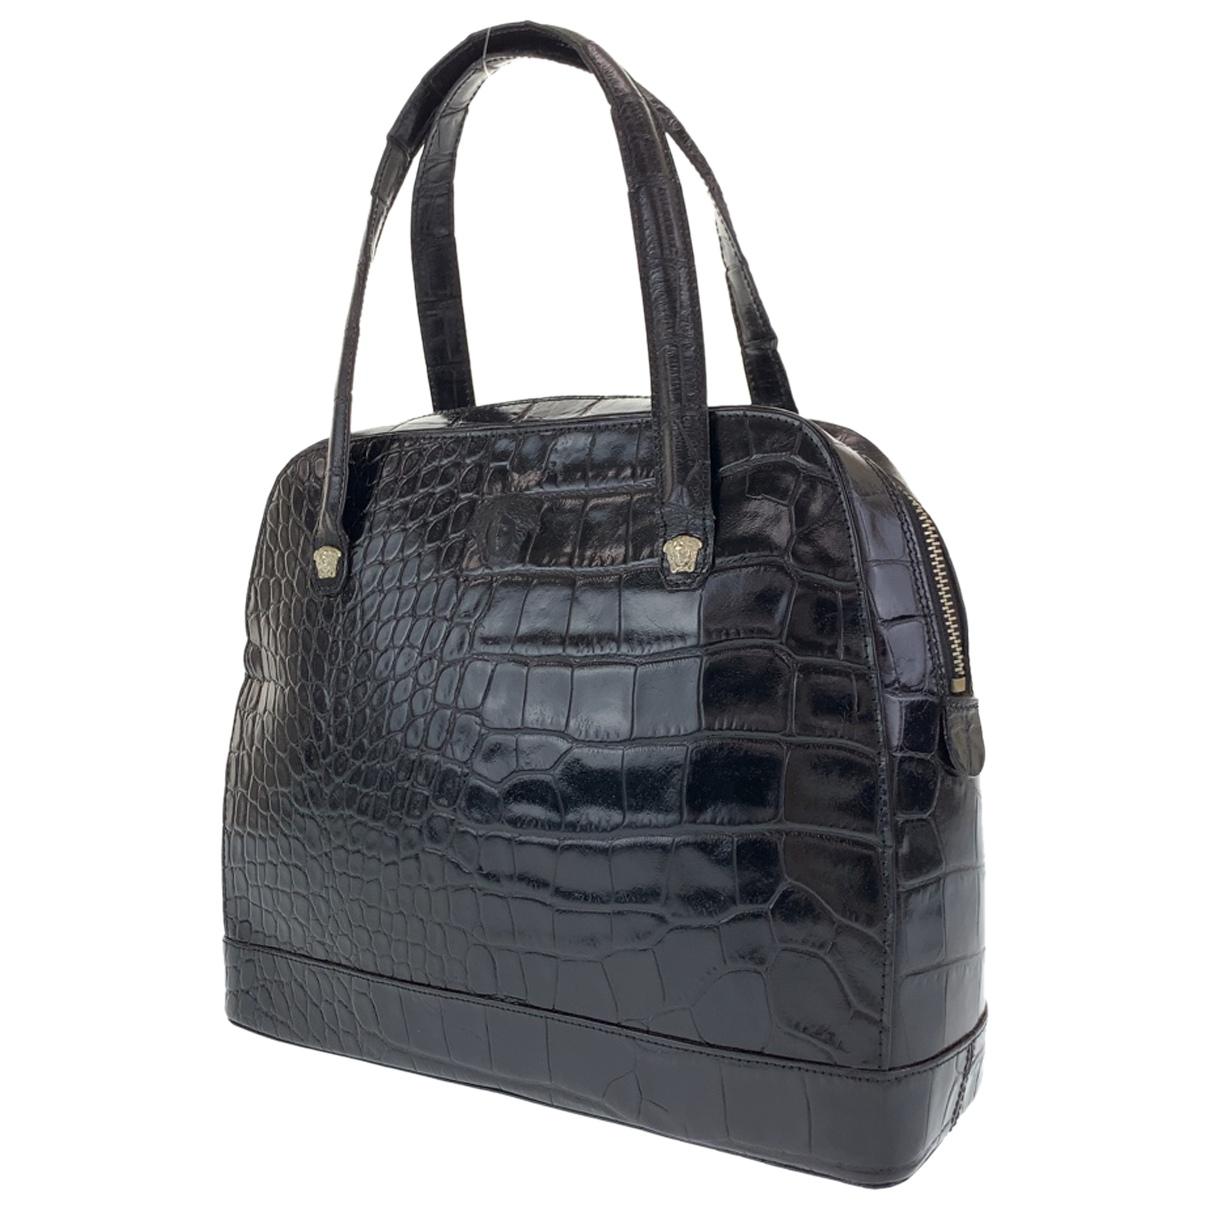 Bolso de Cuero Gianni Versace